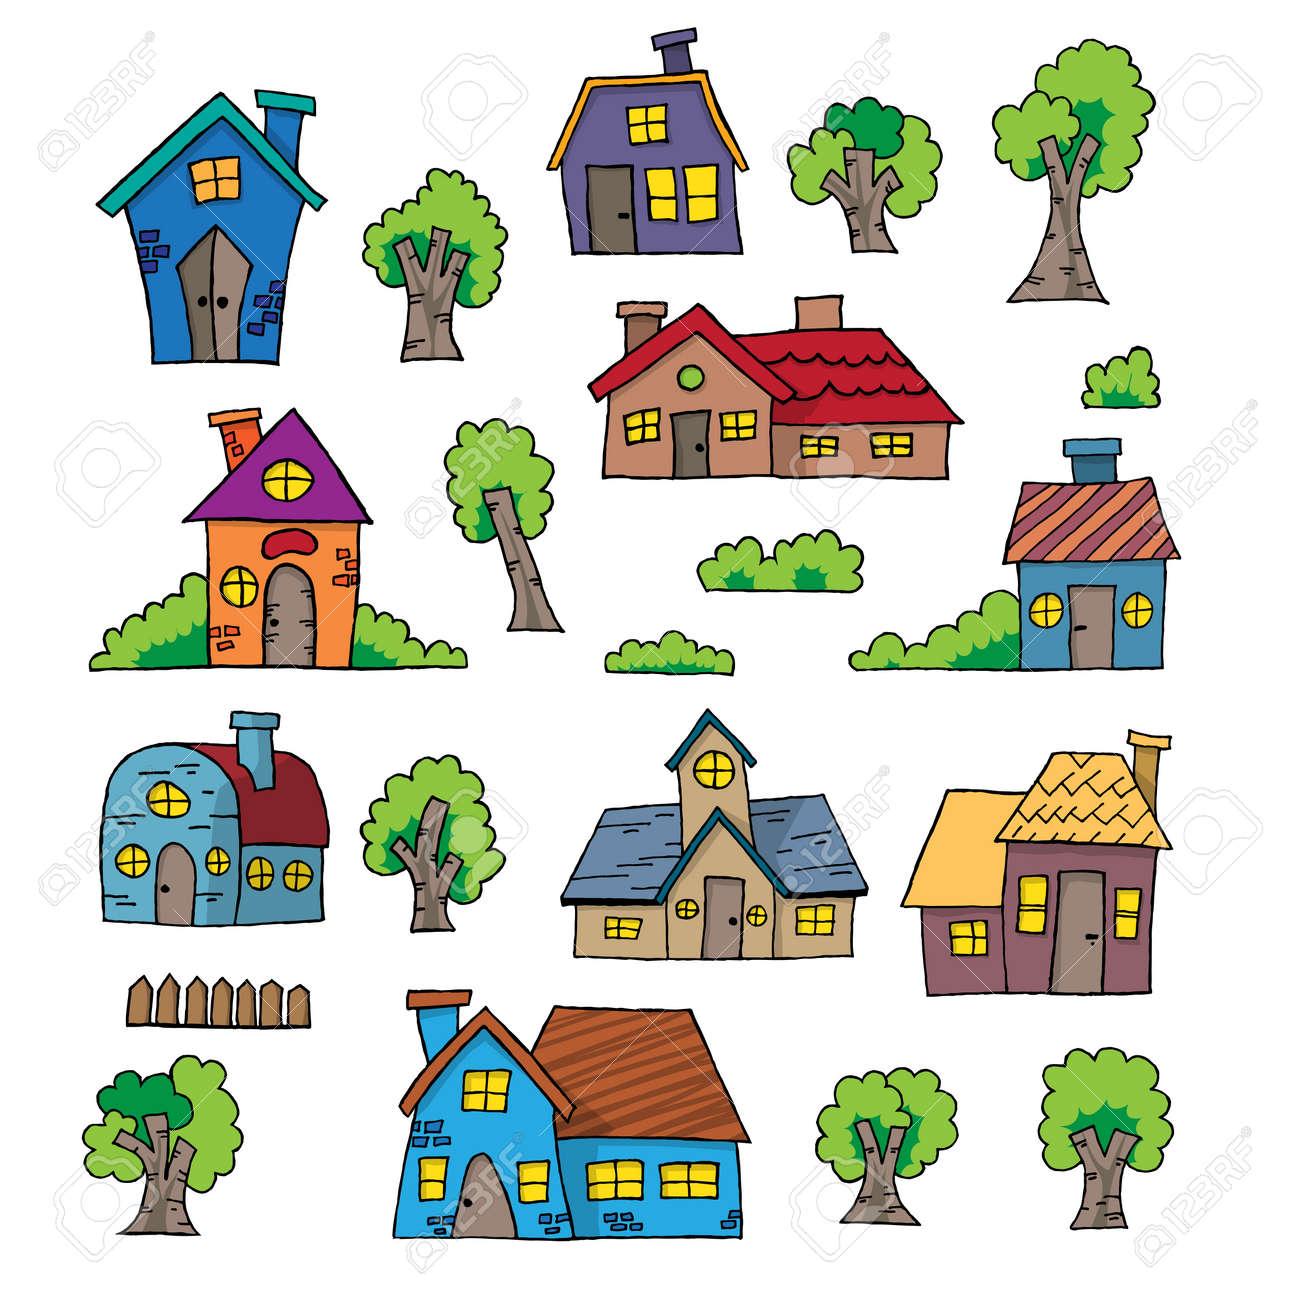 House design cartoon - Illustration Of Cartoon Hand Drawn House Design Element Stock Vector 32601585